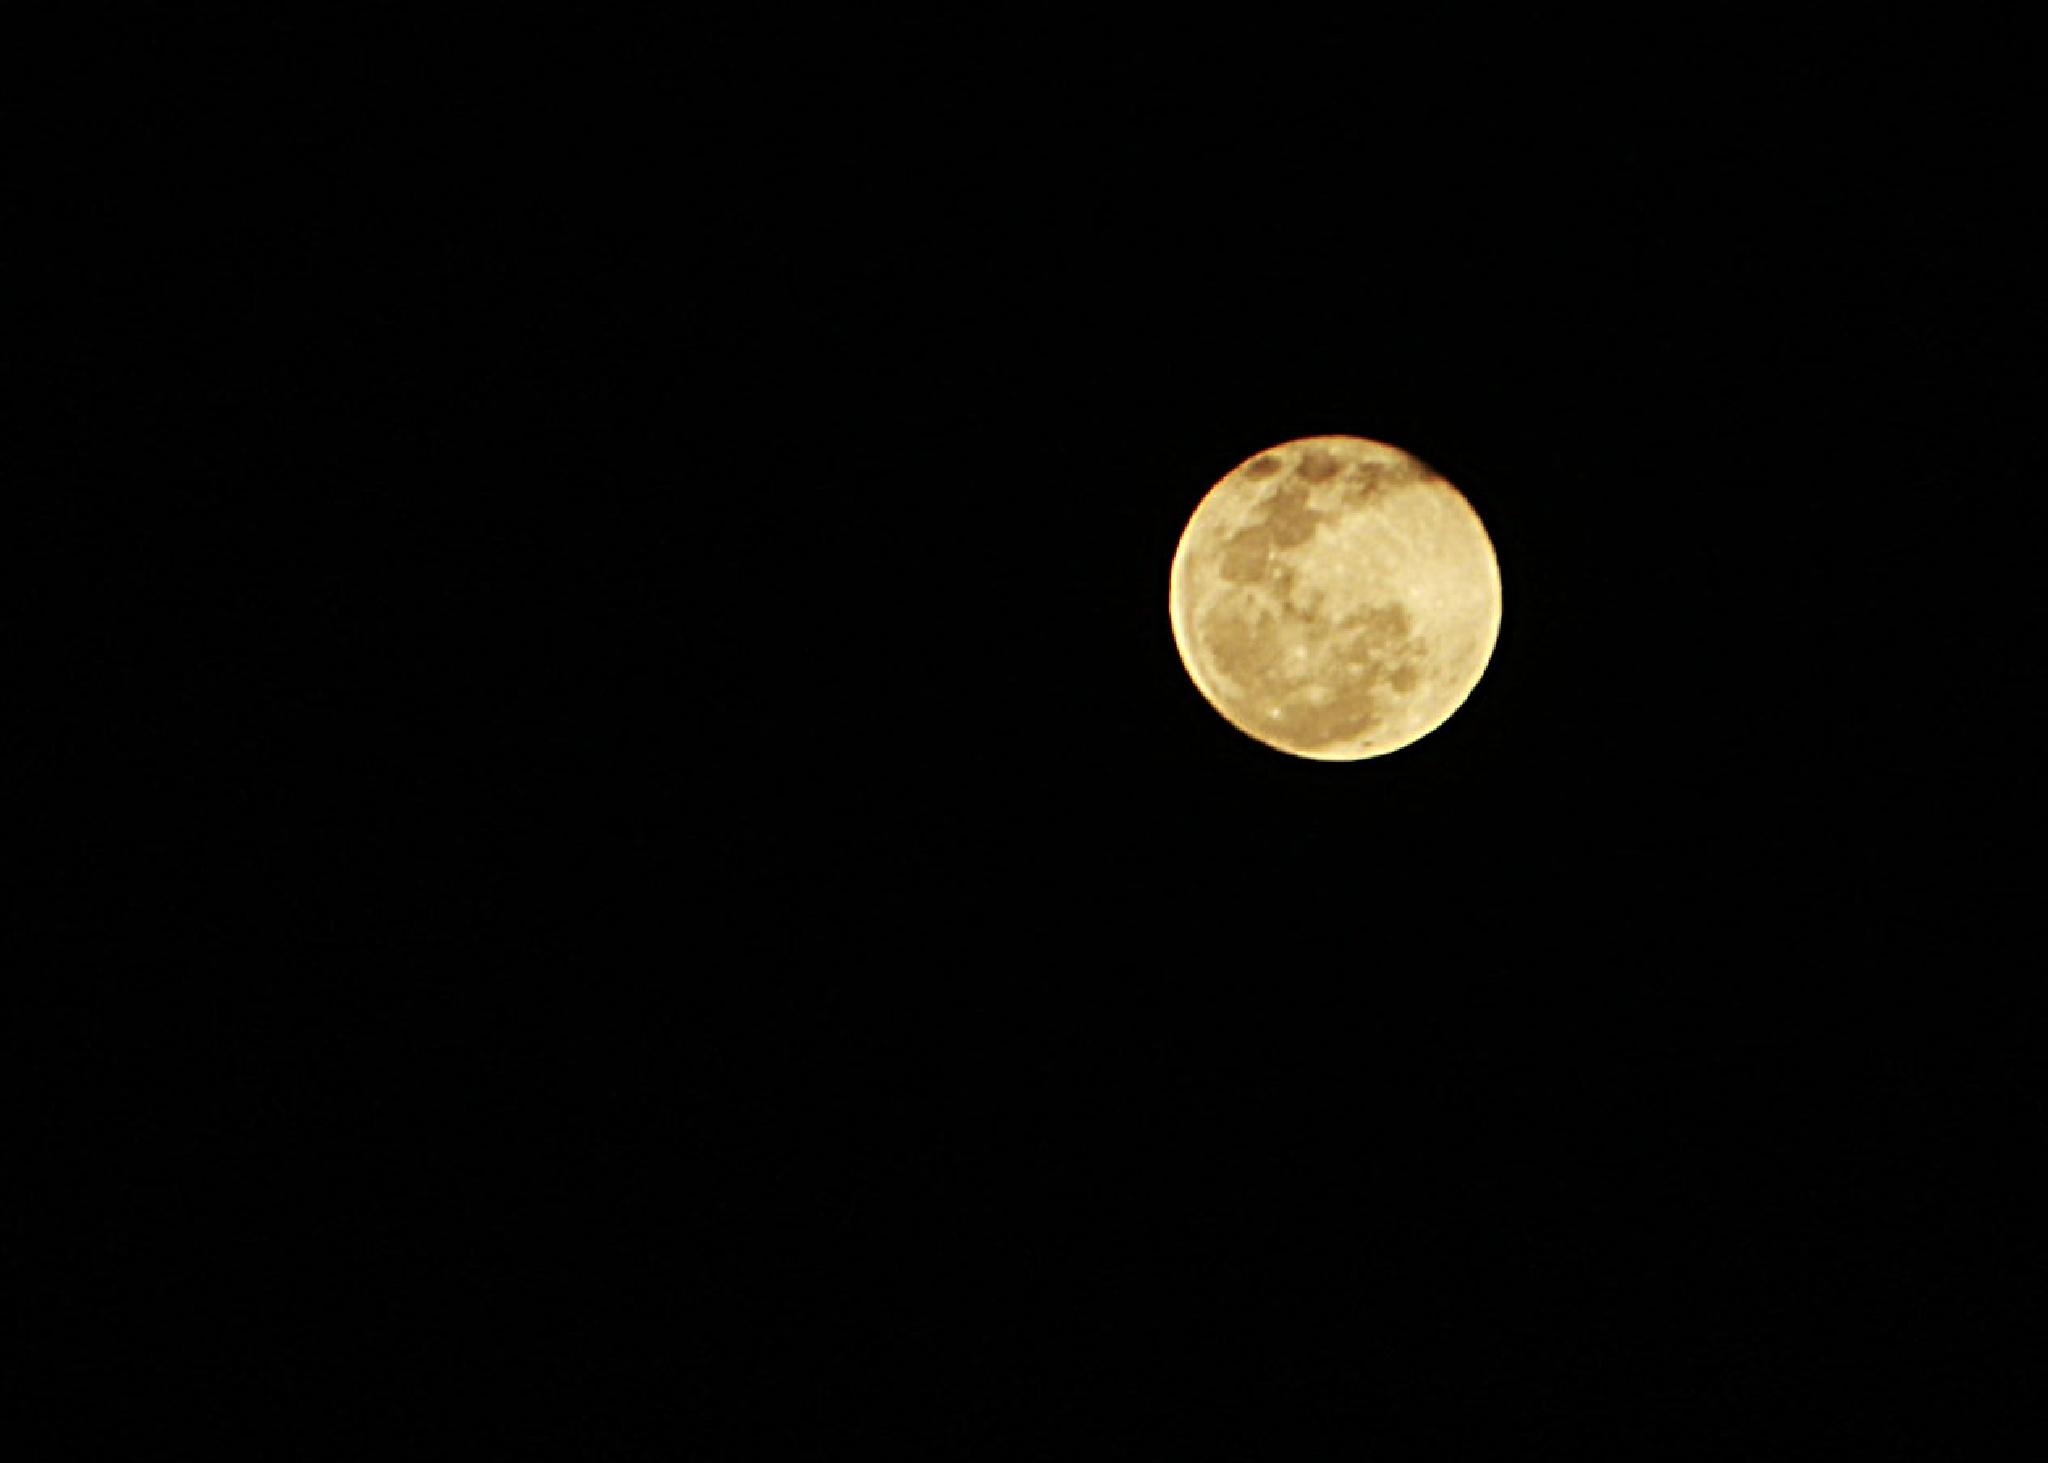 Moon by Sibelle carolina Vargas